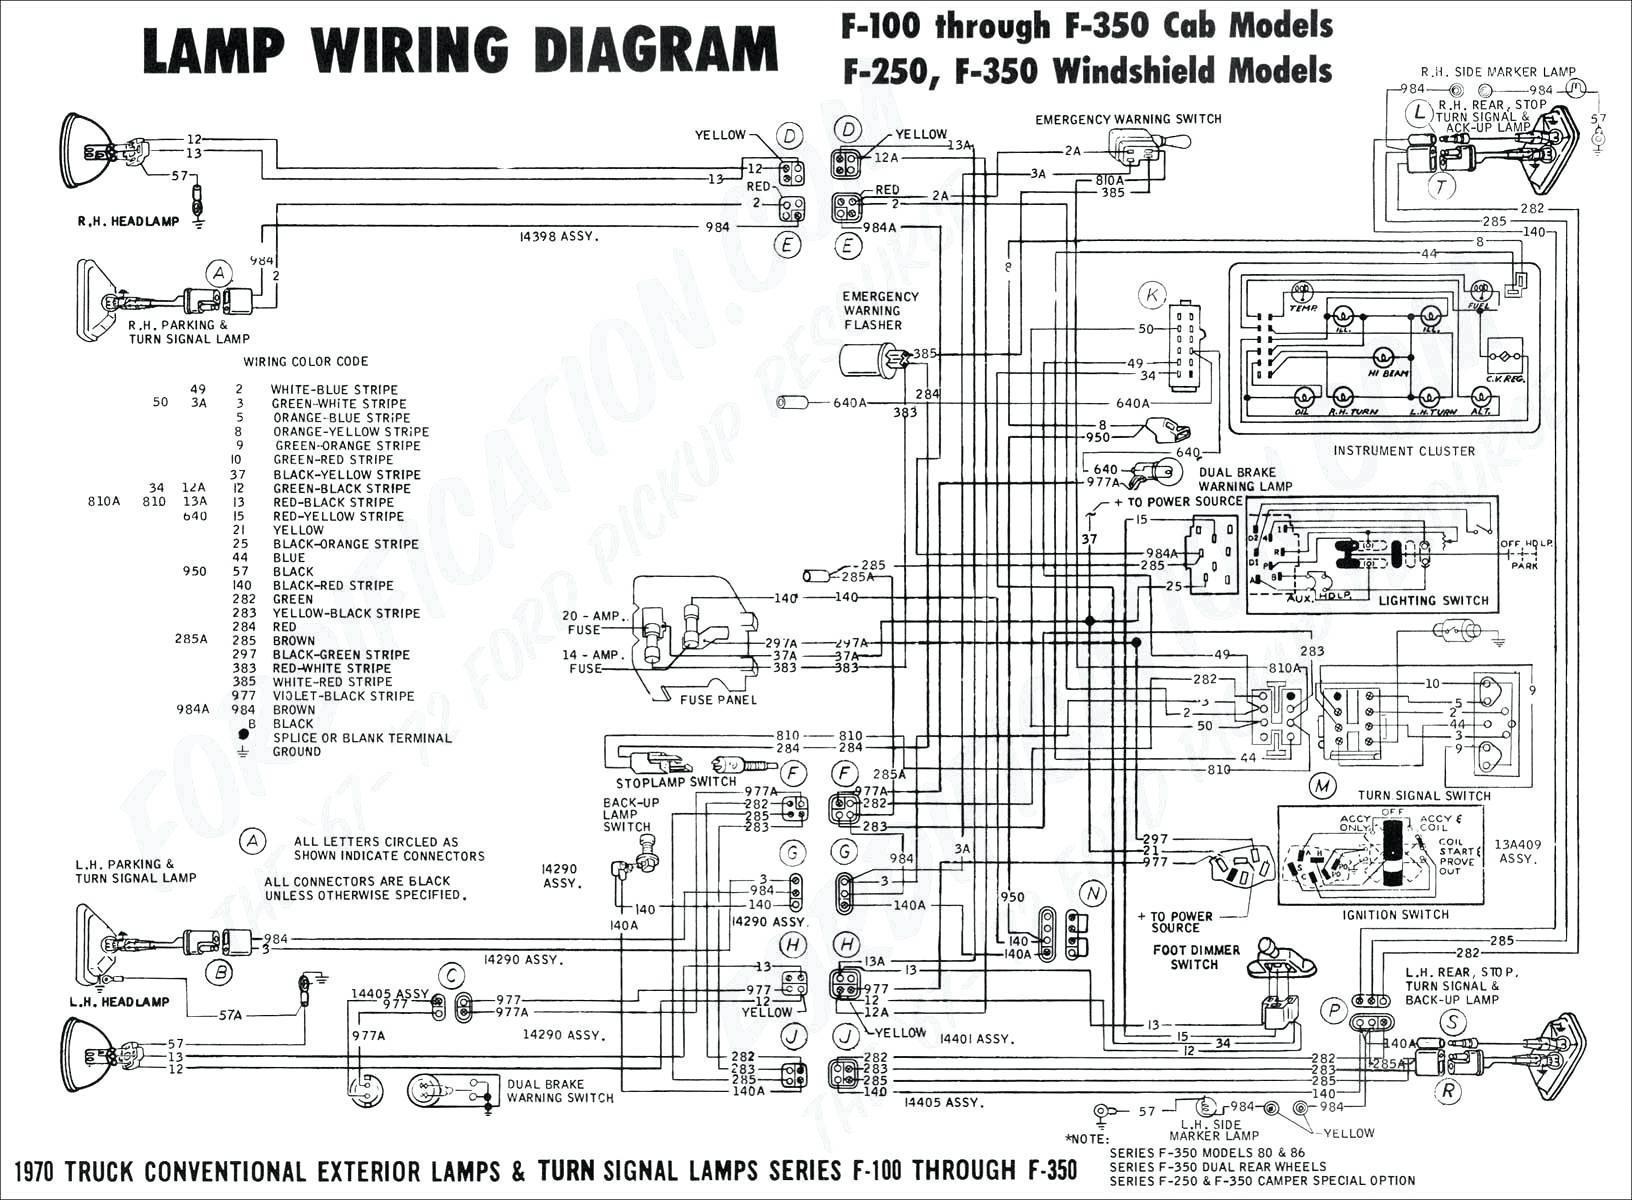 1999 Dodge Caravan Engine Diagram 2006 Dodge Wiring Diagram Another Blog About Wiring Diagram • Of 1999 Dodge Caravan Engine Diagram